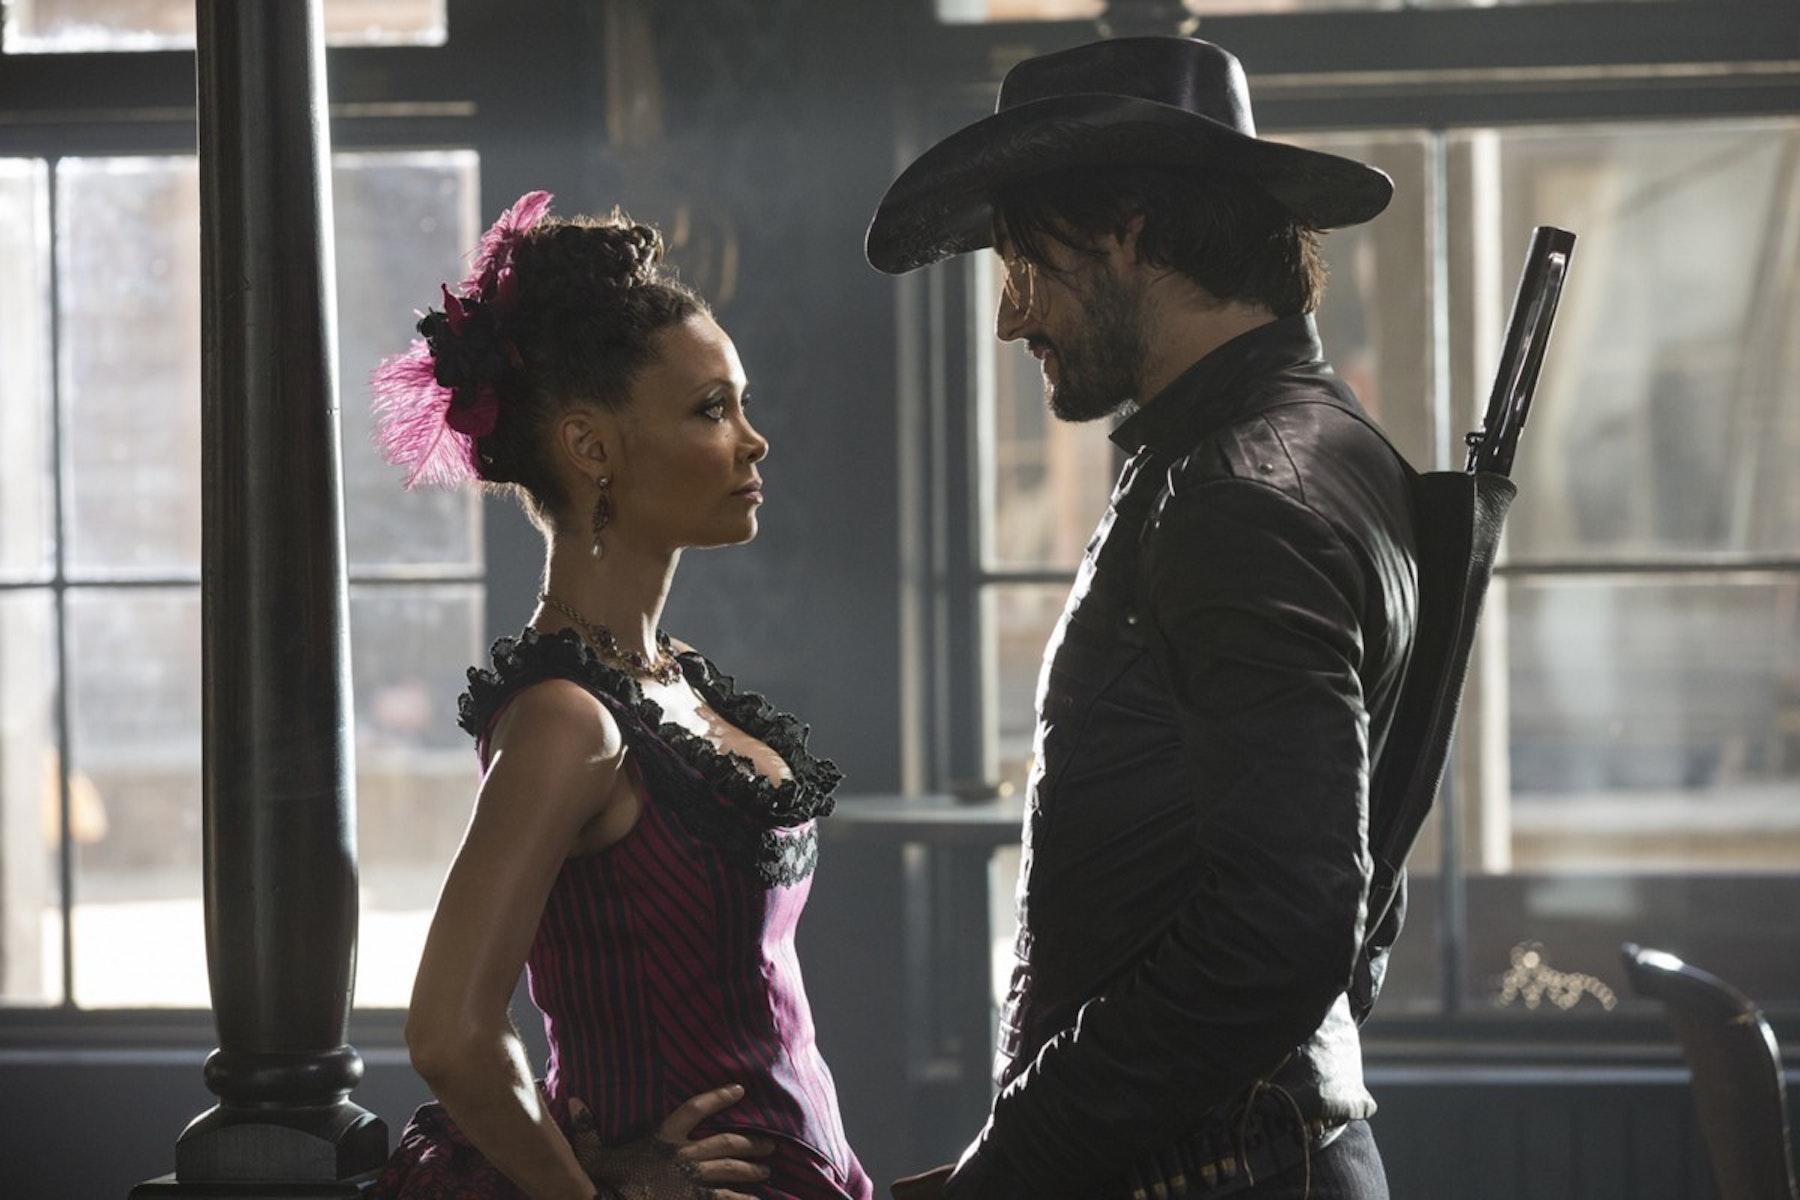 Thandie Newton as Maeve and Rodrigo Santoroas Hector Escaton.